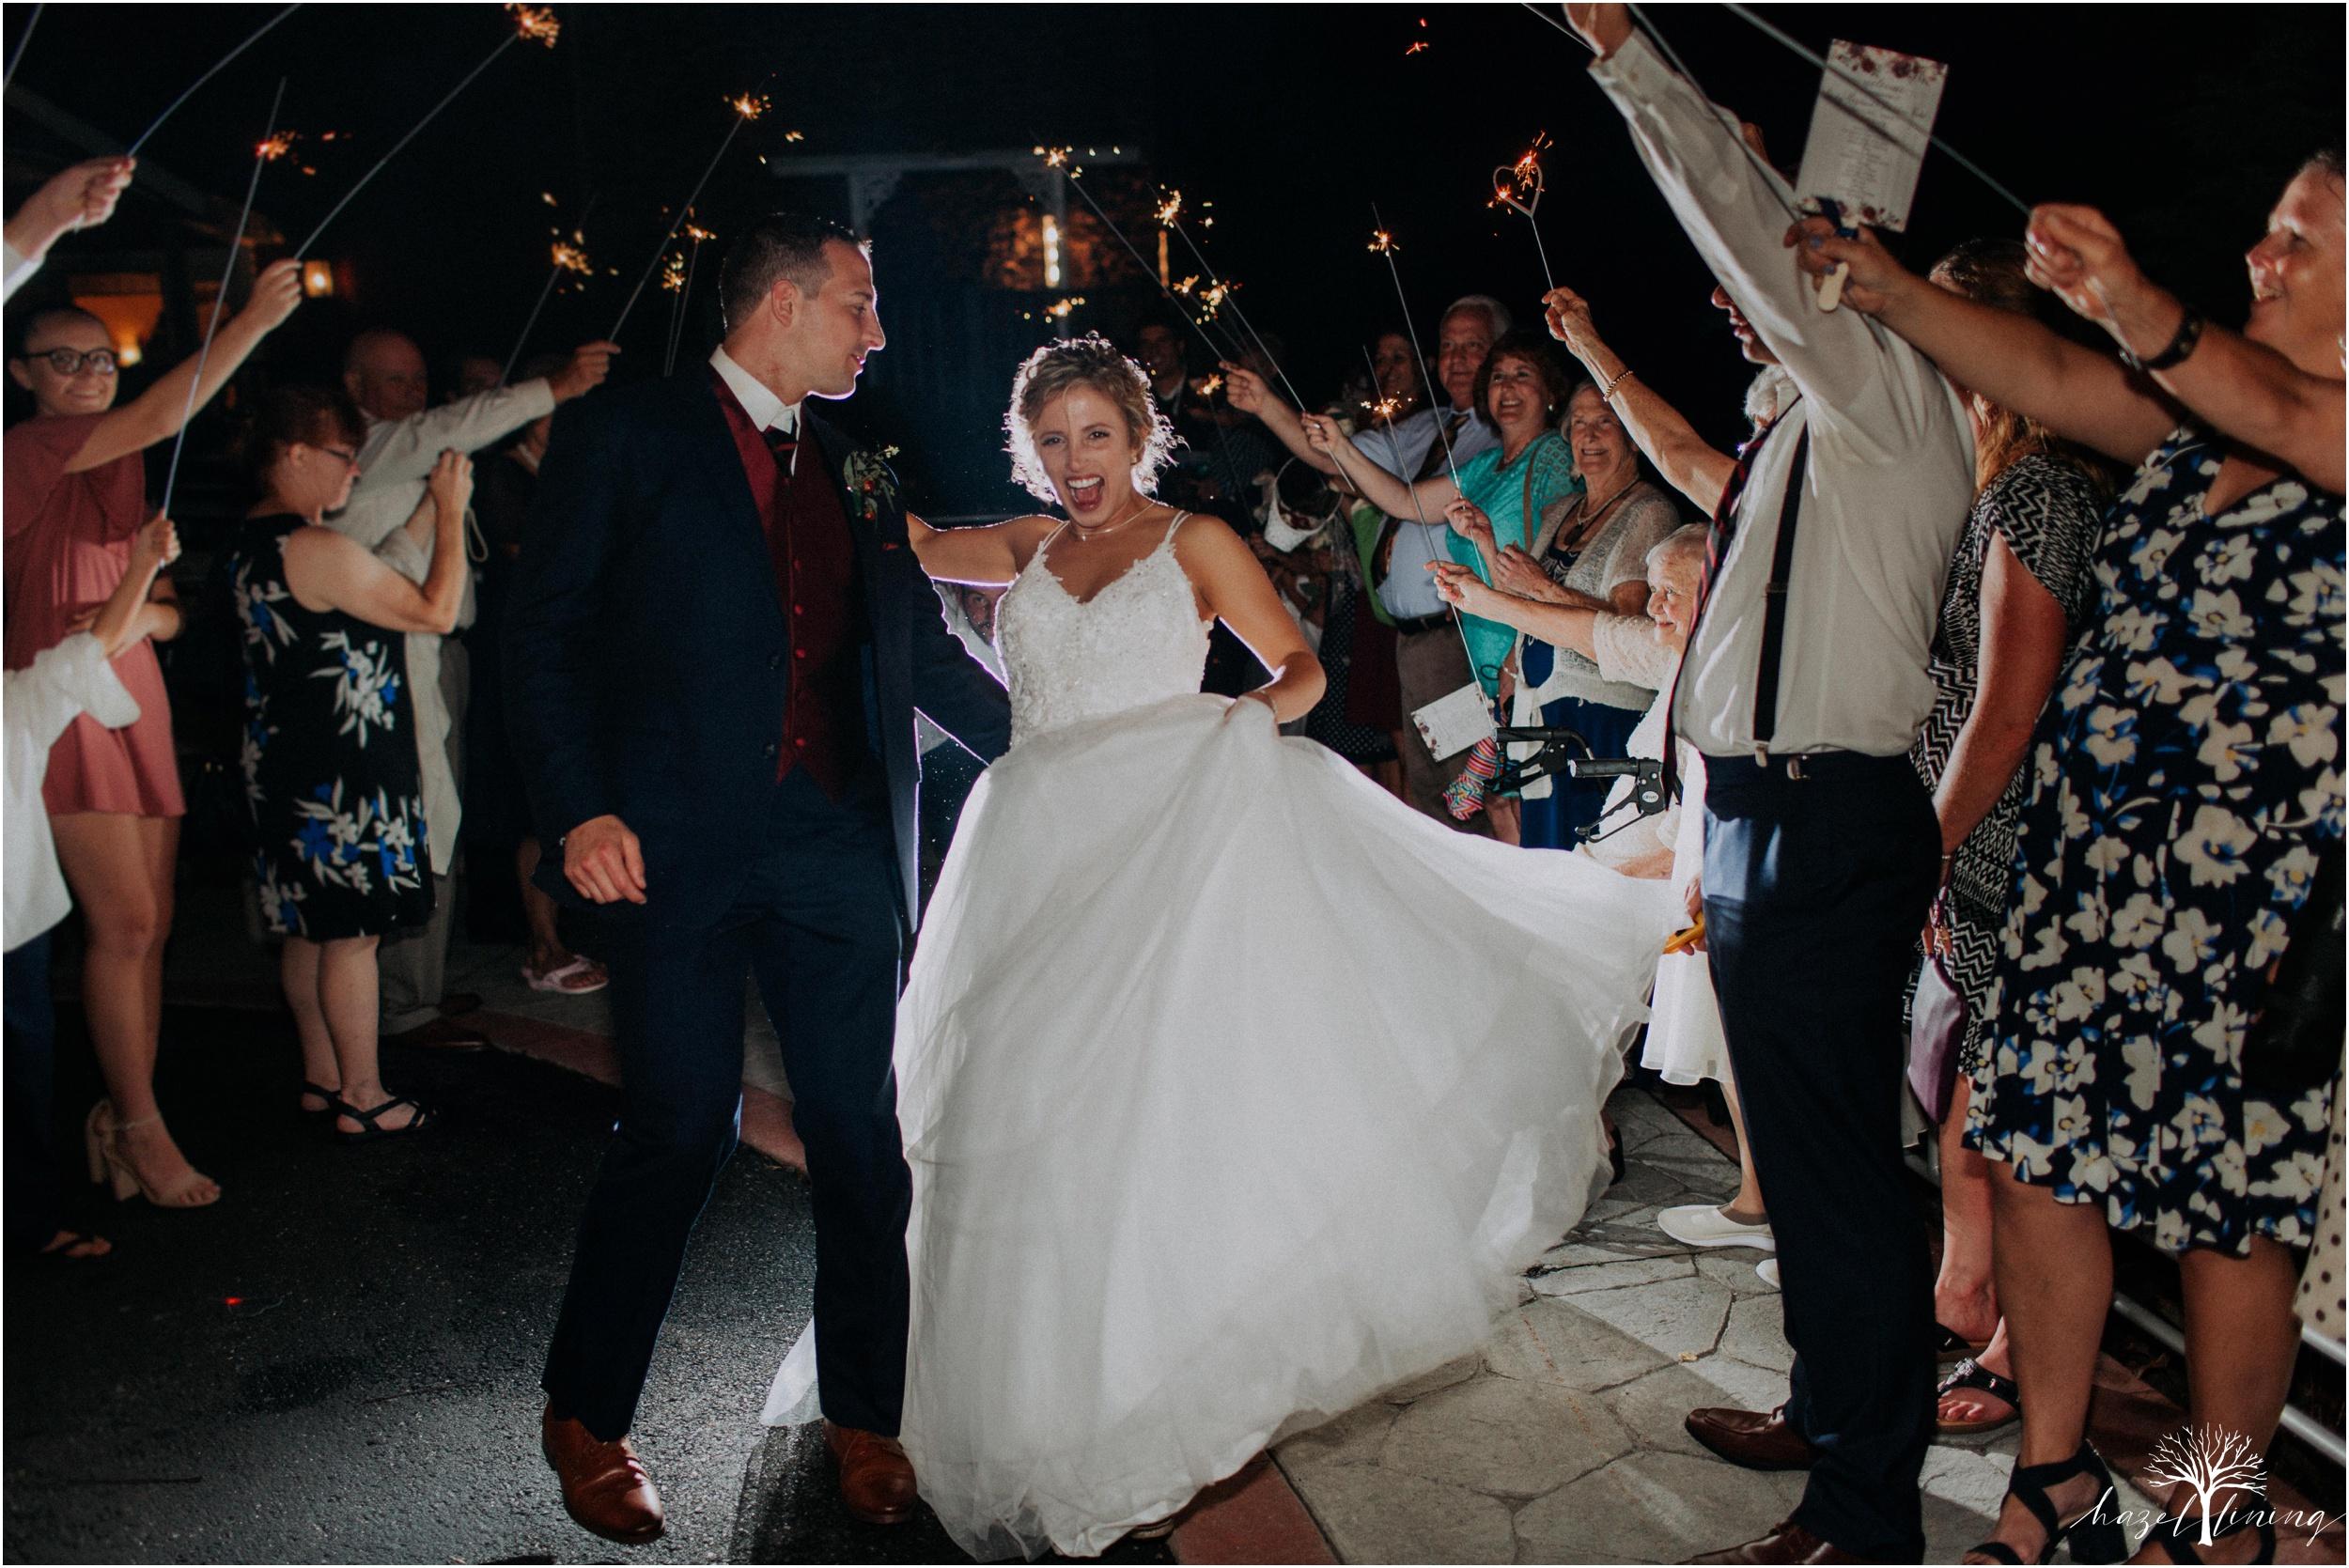 jonathan-weibel-becky-haywood-loft-at-sweetwater-cc-pennsburg-pennsylvania-rainy-day-summer-wedding-hazel-lining-travel-wedding-elopement-photography_0160.jpg